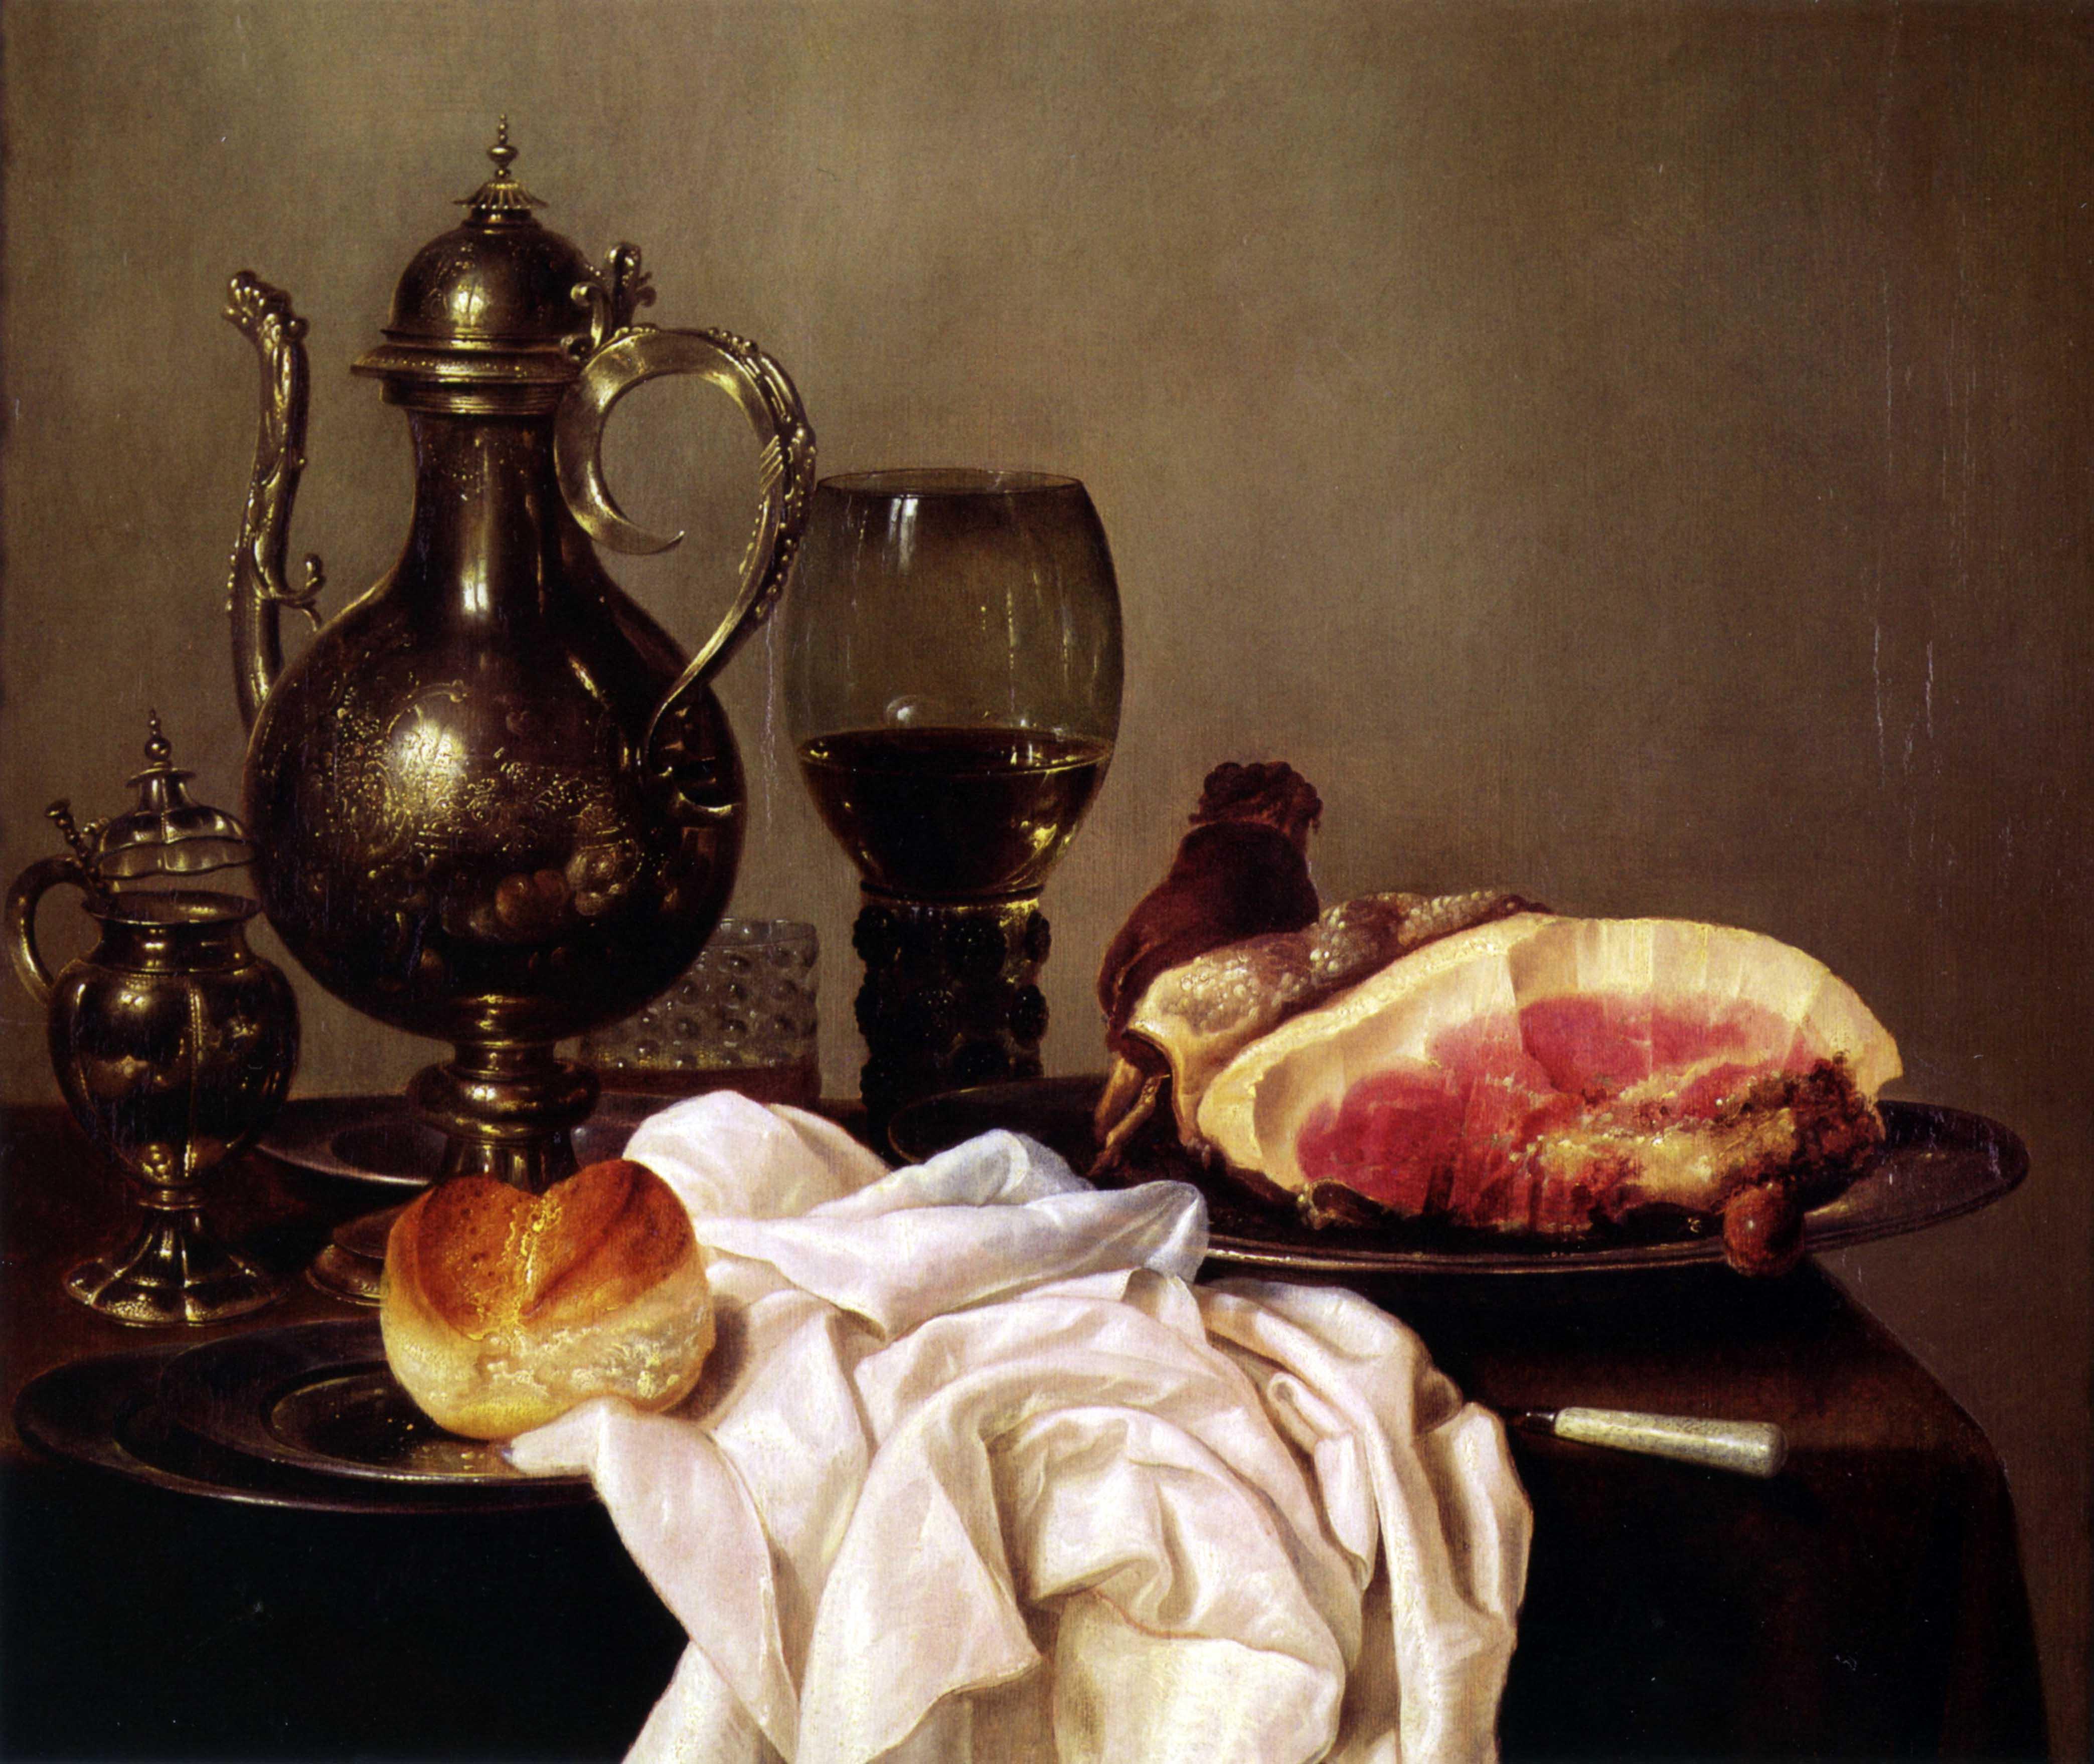 WILLEM CLAESZ HEDA (1594-1680), Breakfast_still_life,_XVII sec. (Collezione Privata)